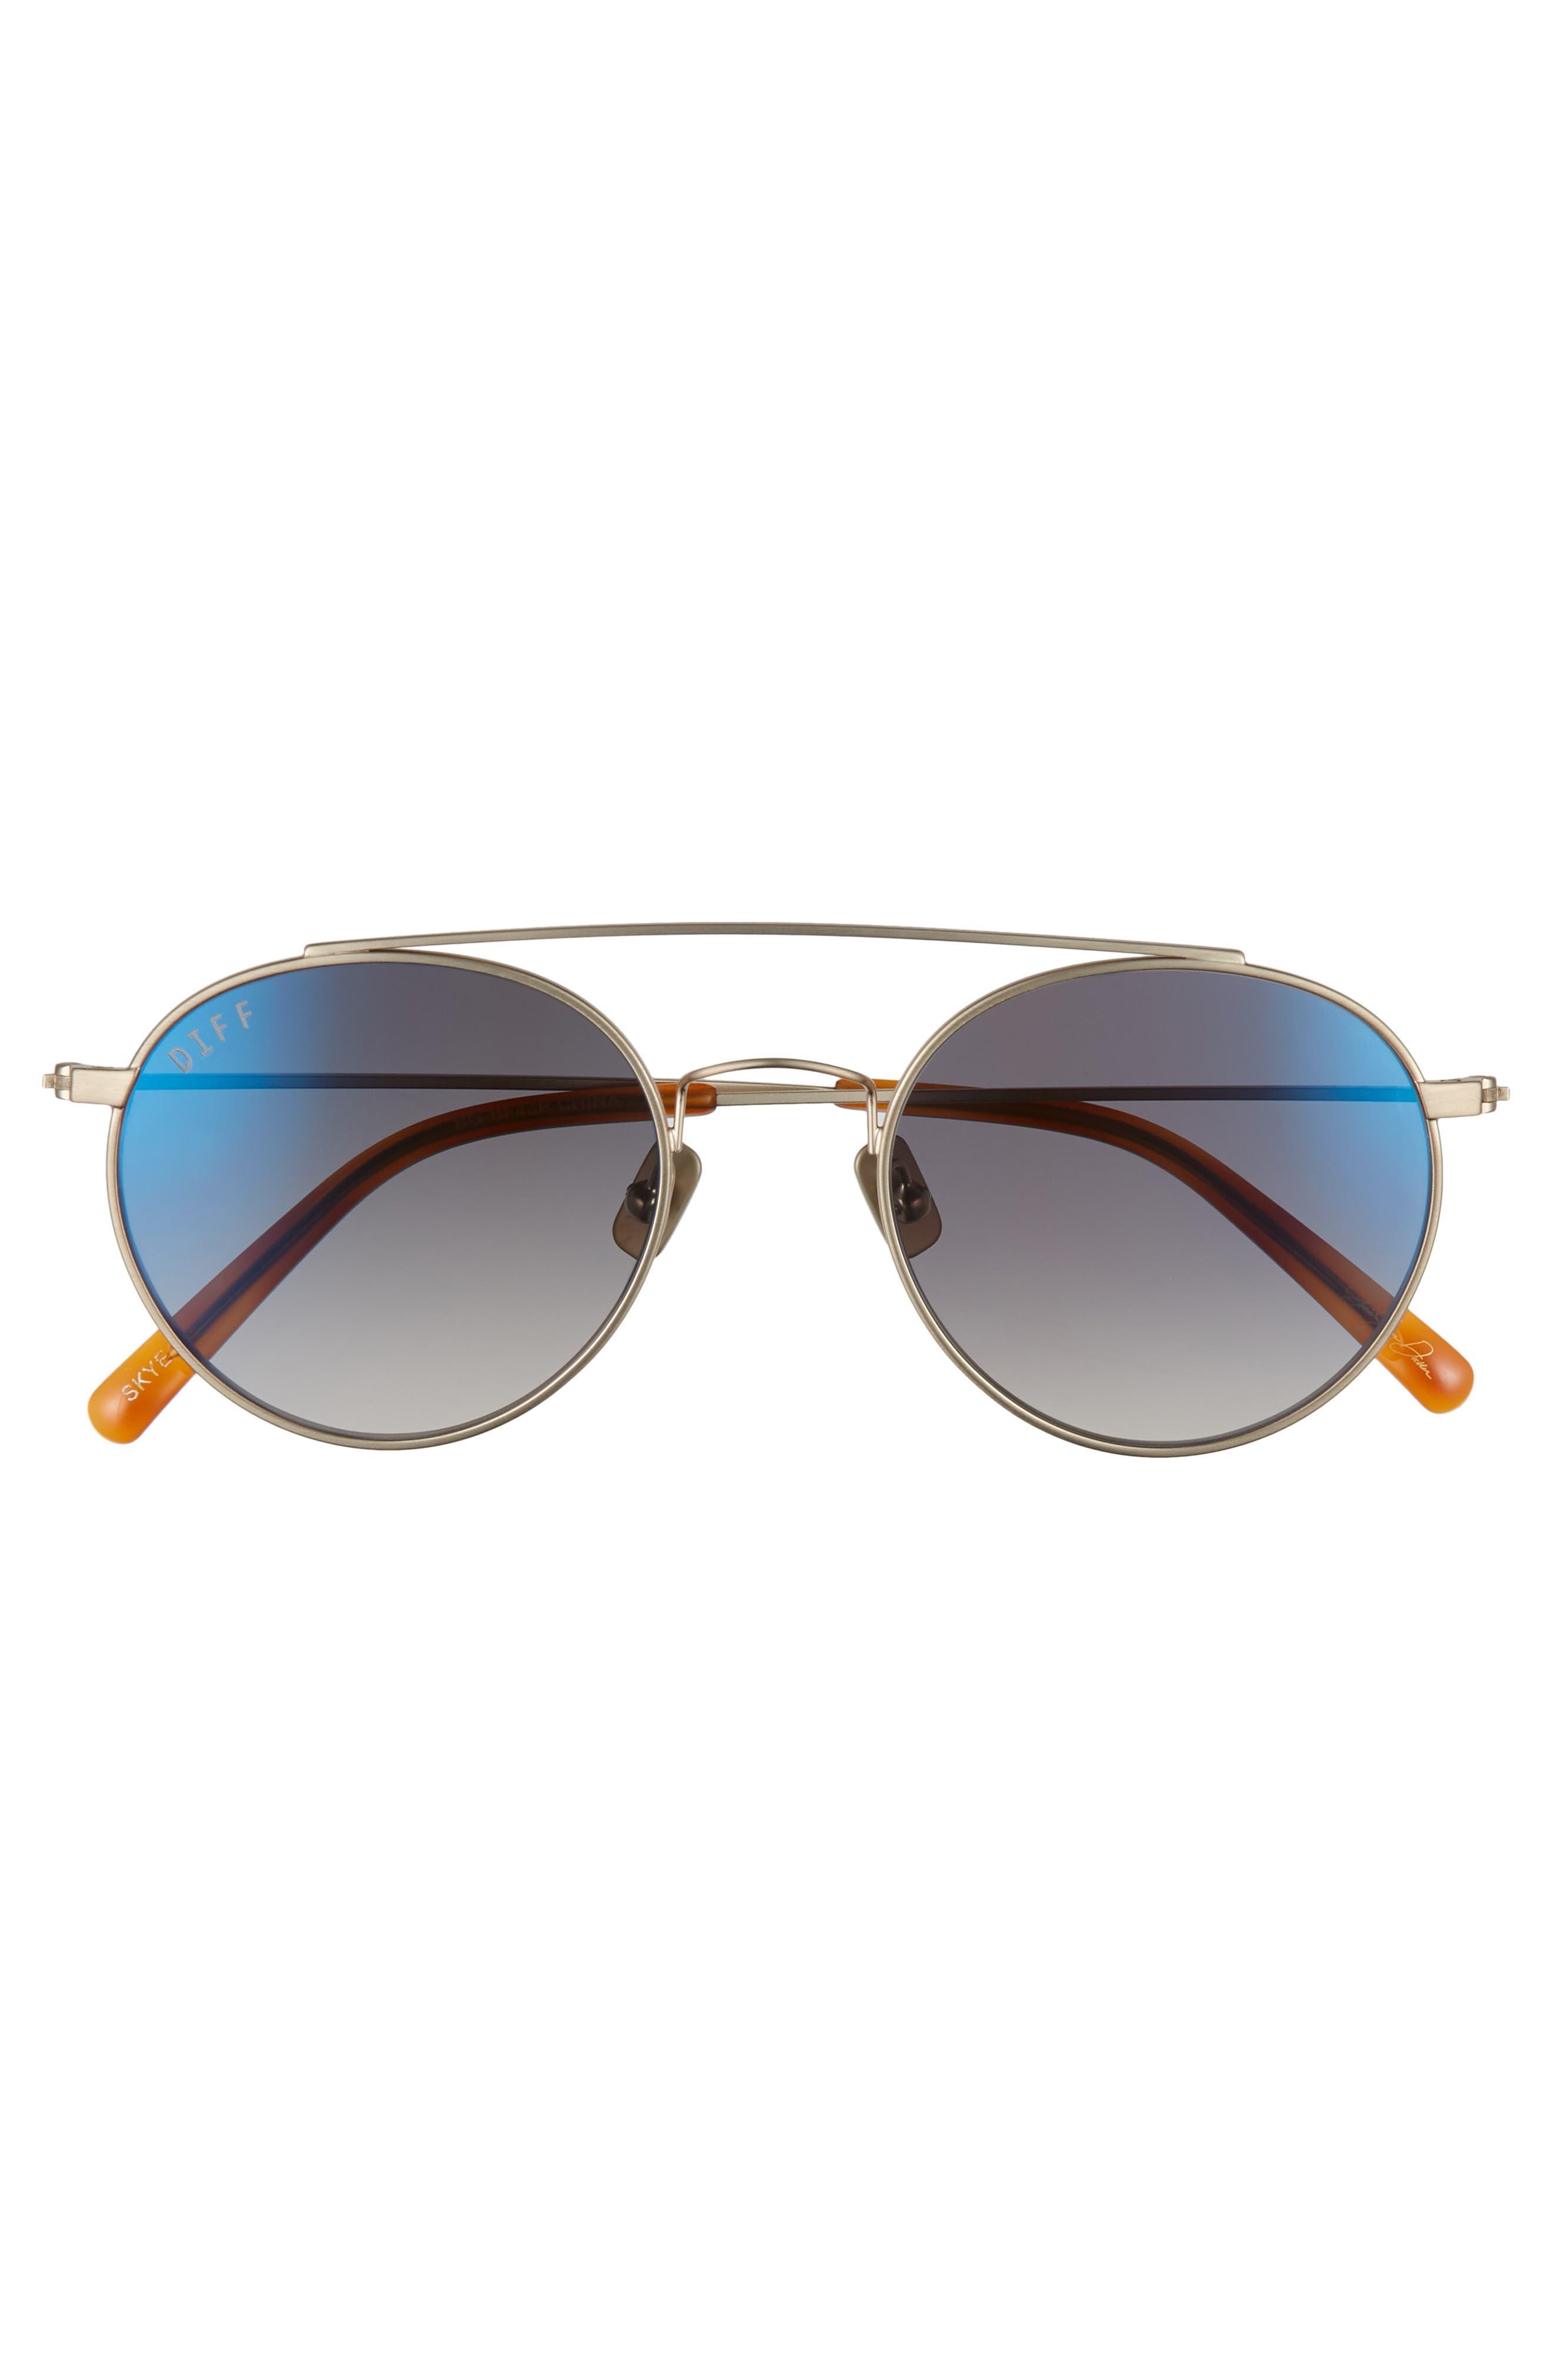 Skye 51mm Aviator Sunglasses,                             Alternate thumbnail 3, color,                             BRUSHED GOLD/ BLUE